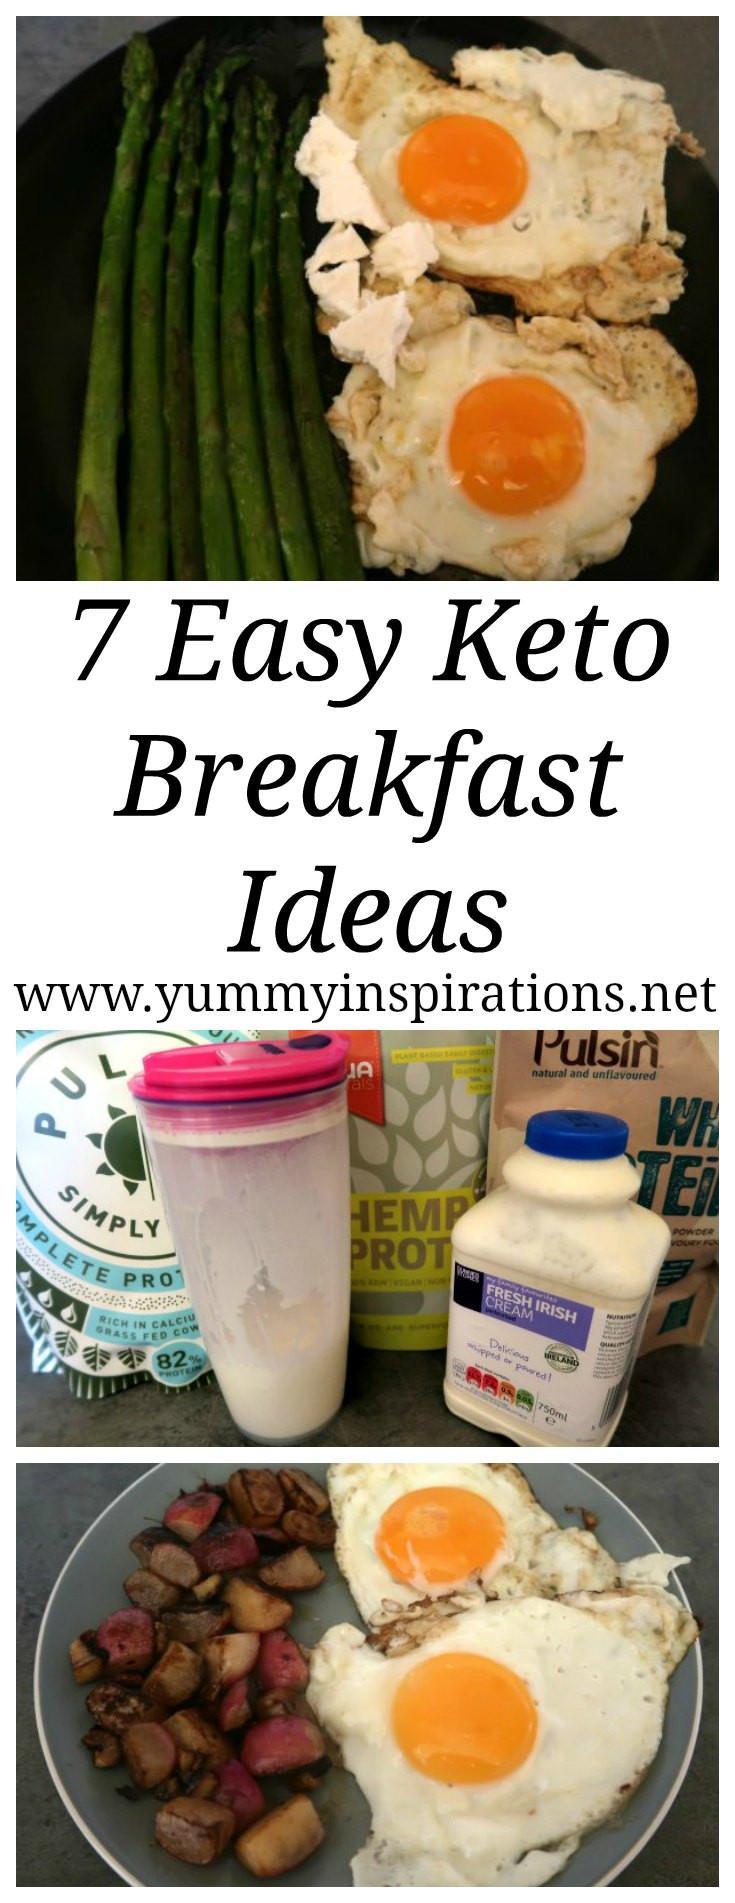 Keto Diet Recipes Breakfast  7 Easy Keto Breakfast Ideas Low Carb & Ketogenic Diet